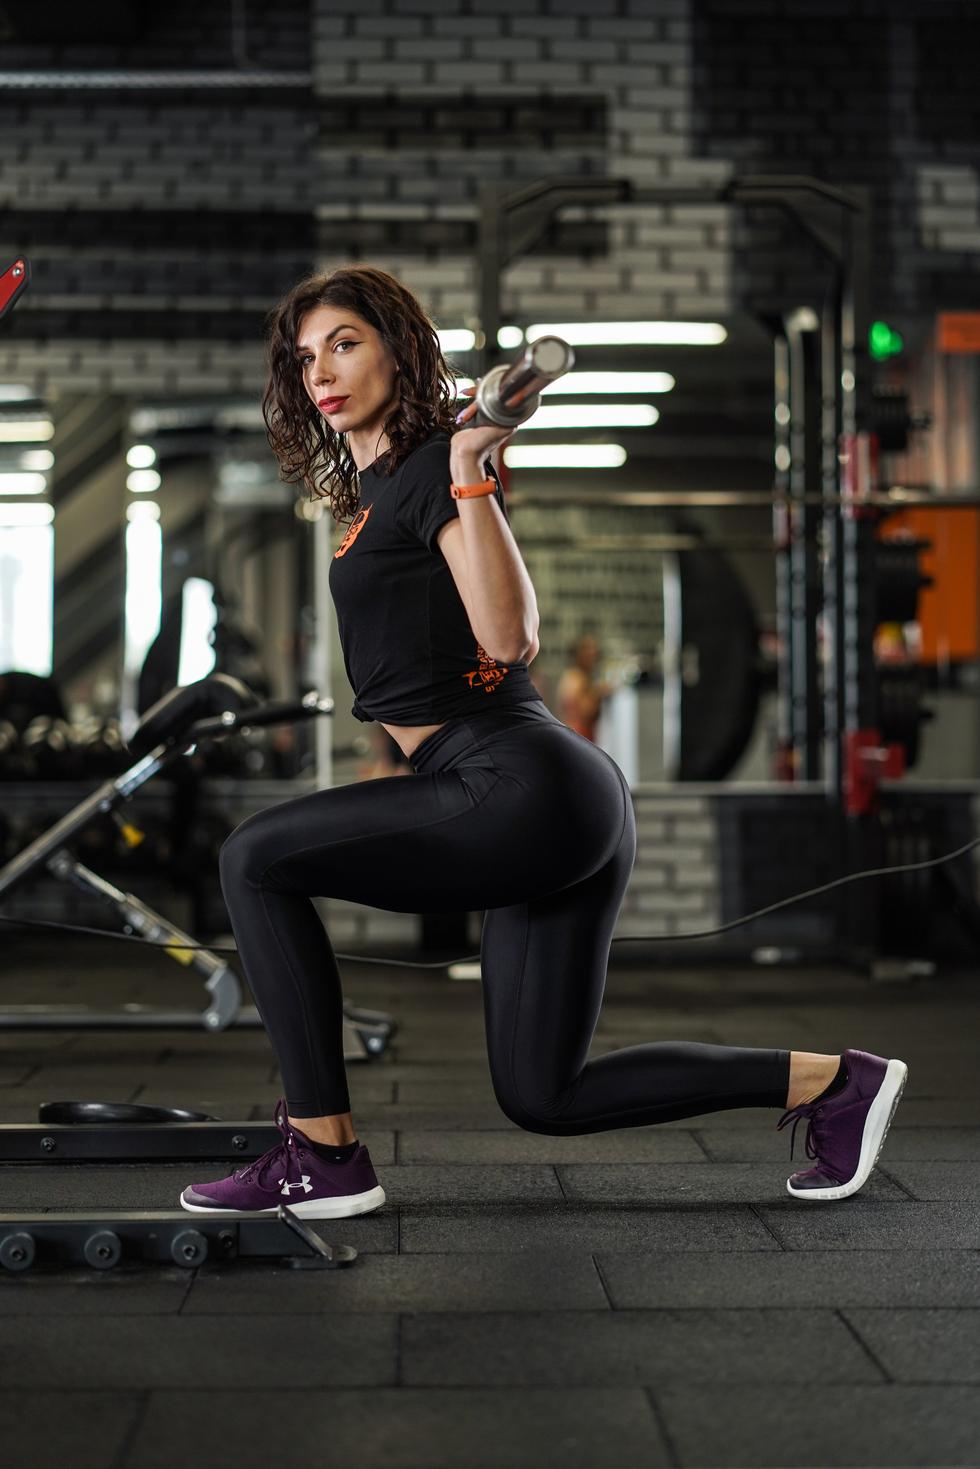 Анастасия Дворядкина, DOG & Grand CrossFit